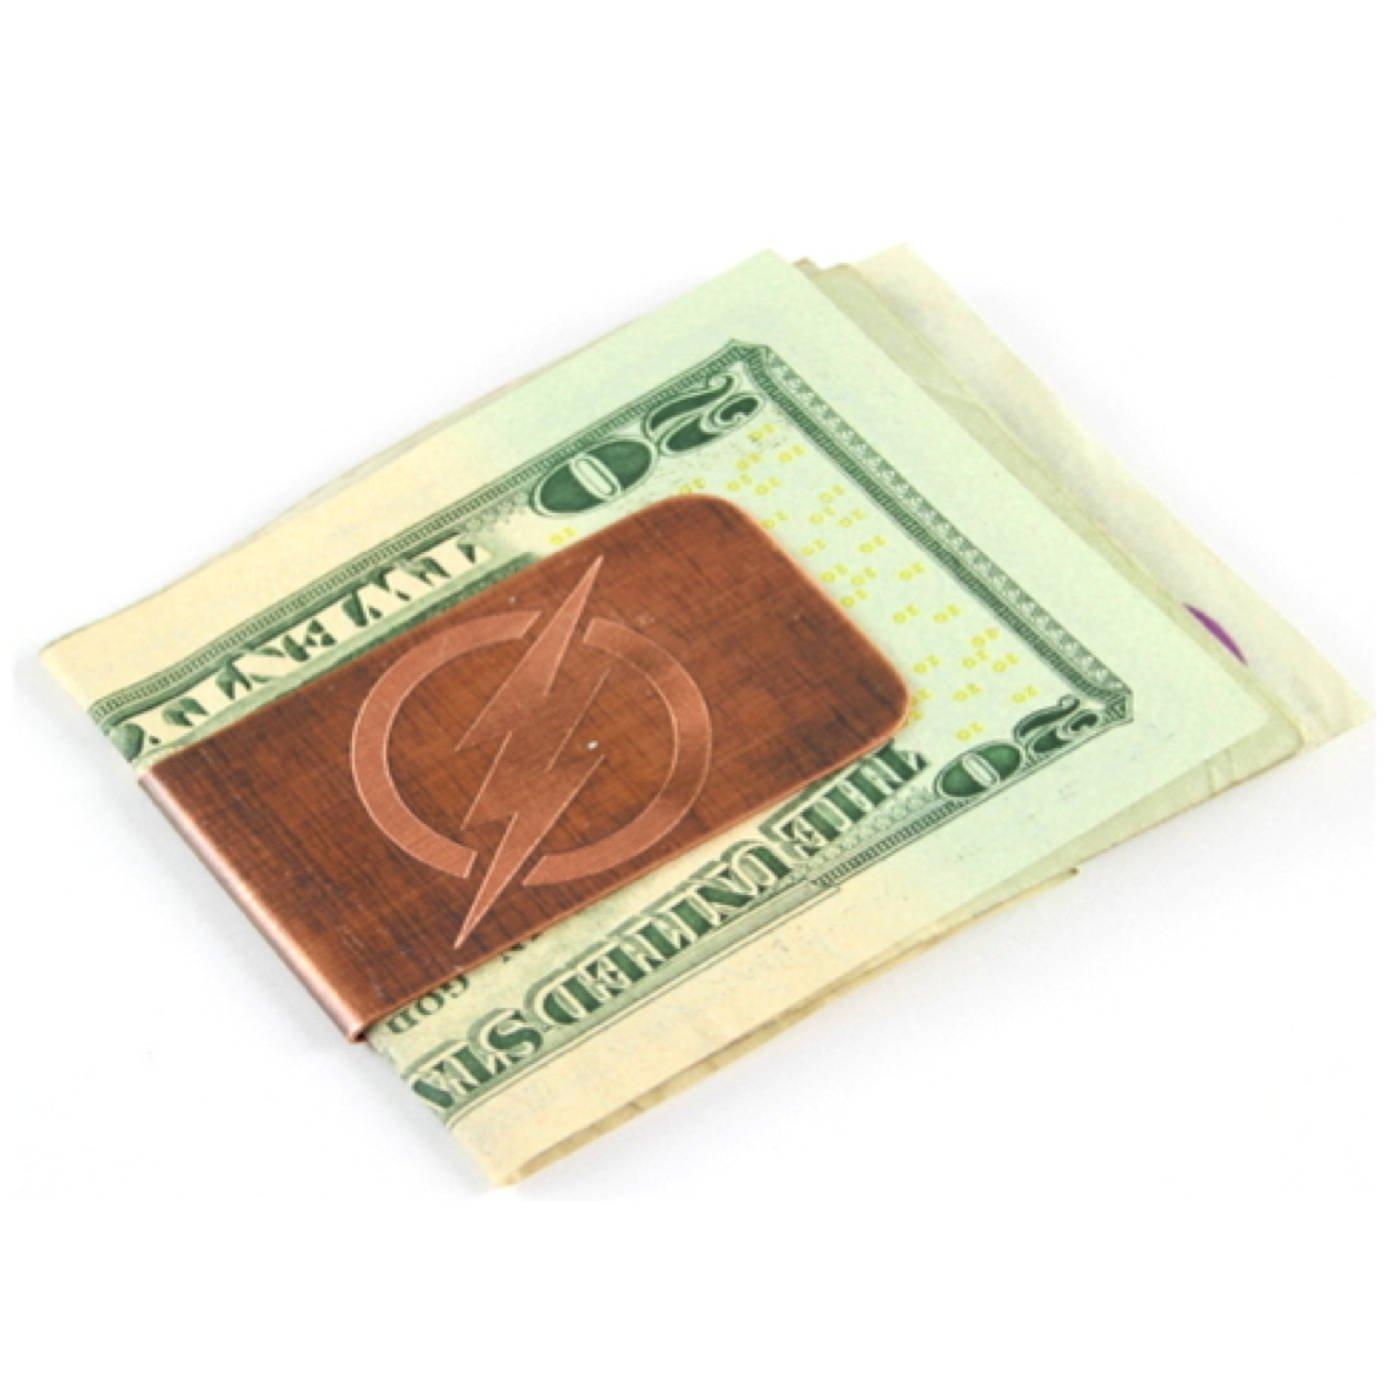 Engraved & Antiqued Copper Money Clip - Superman - Husband gift, Boyfriend Gift, Marvel Comics, DC Comics, Avengers